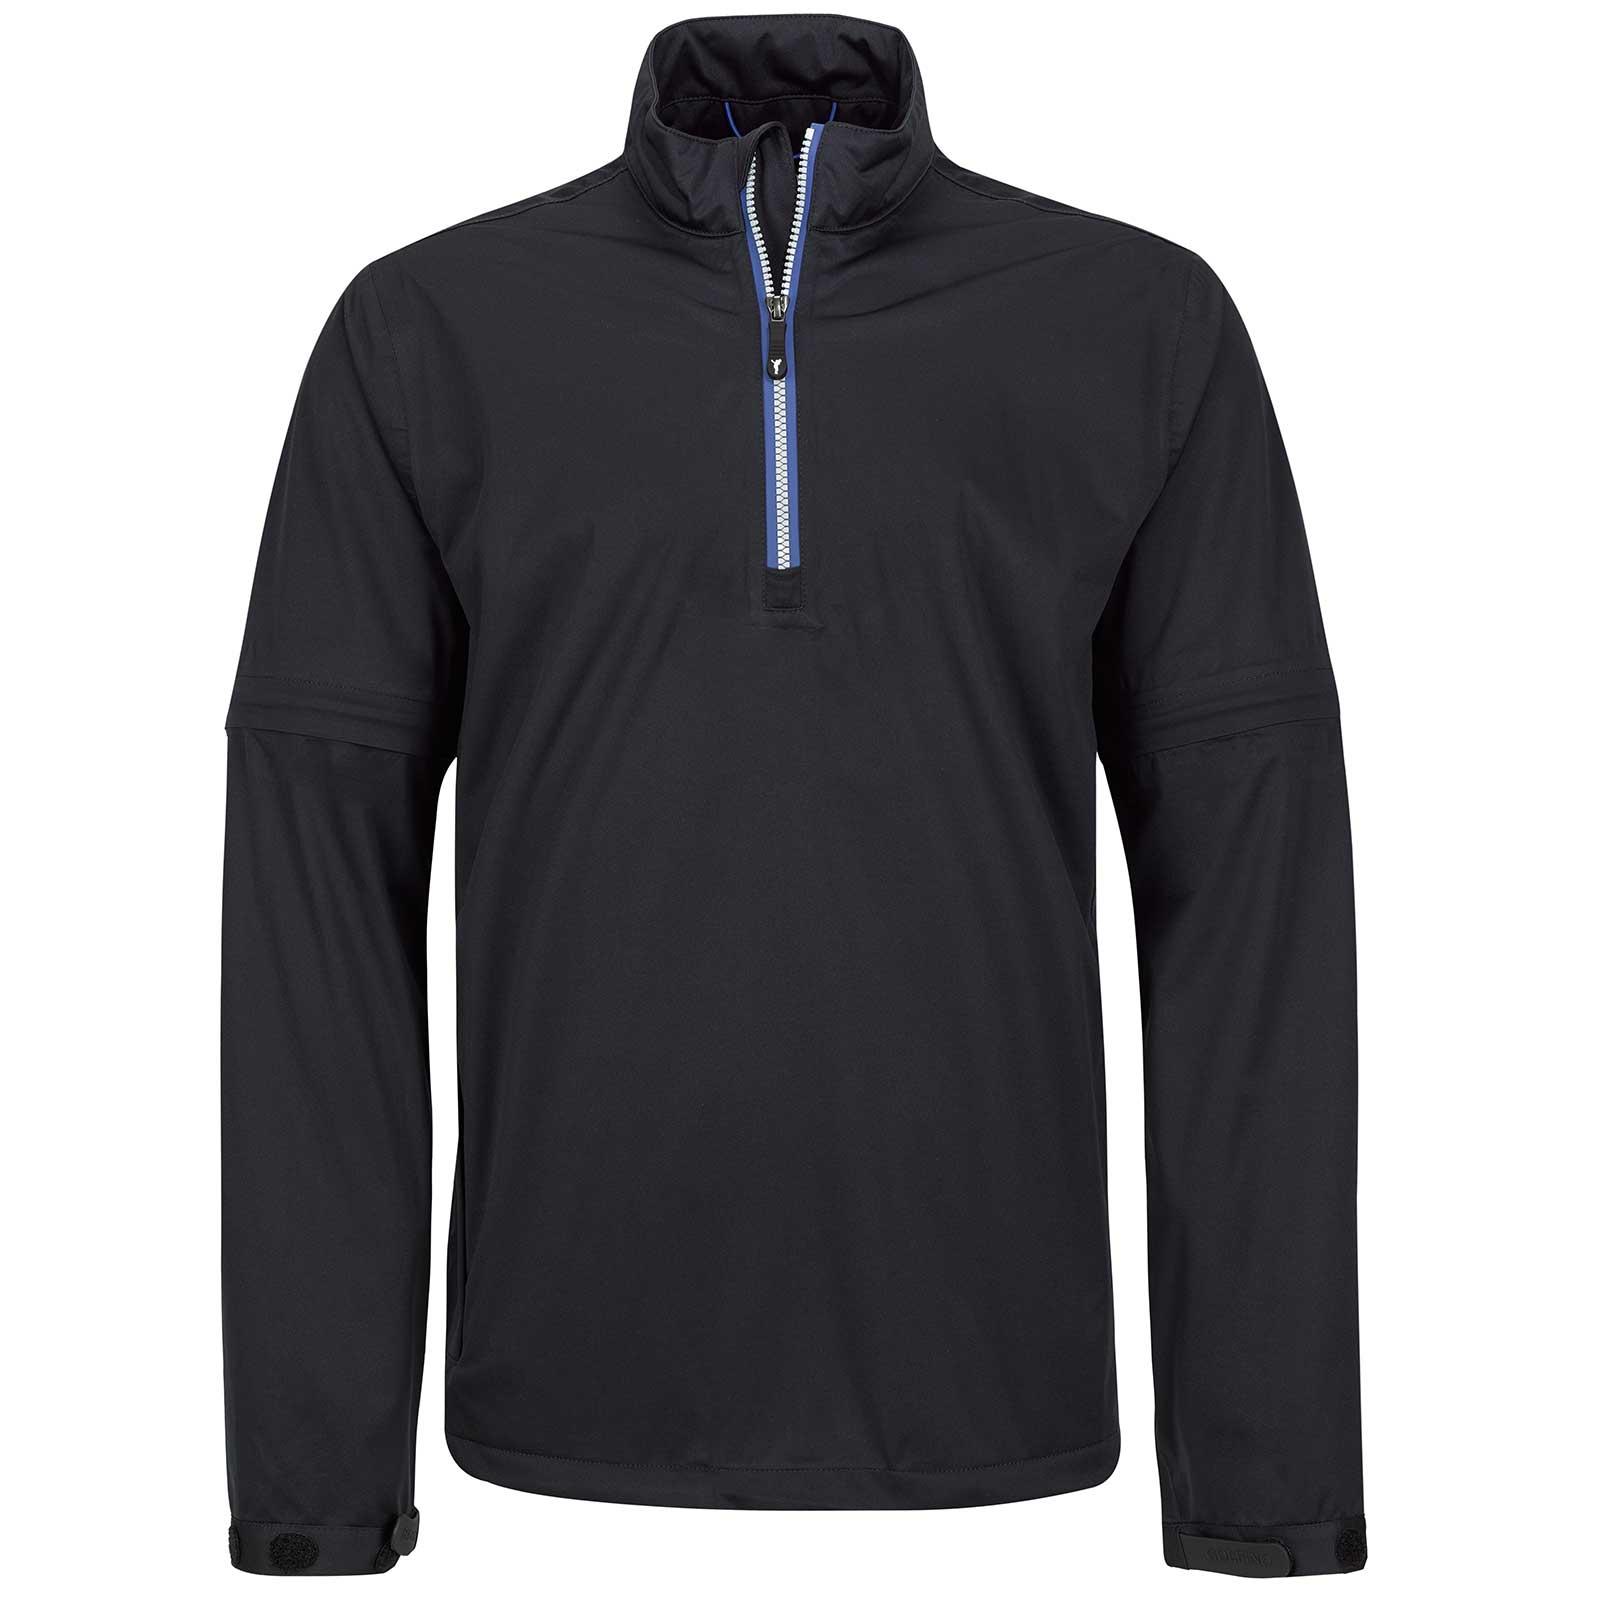 Waterproof men's rain jacket with detachable sleeves